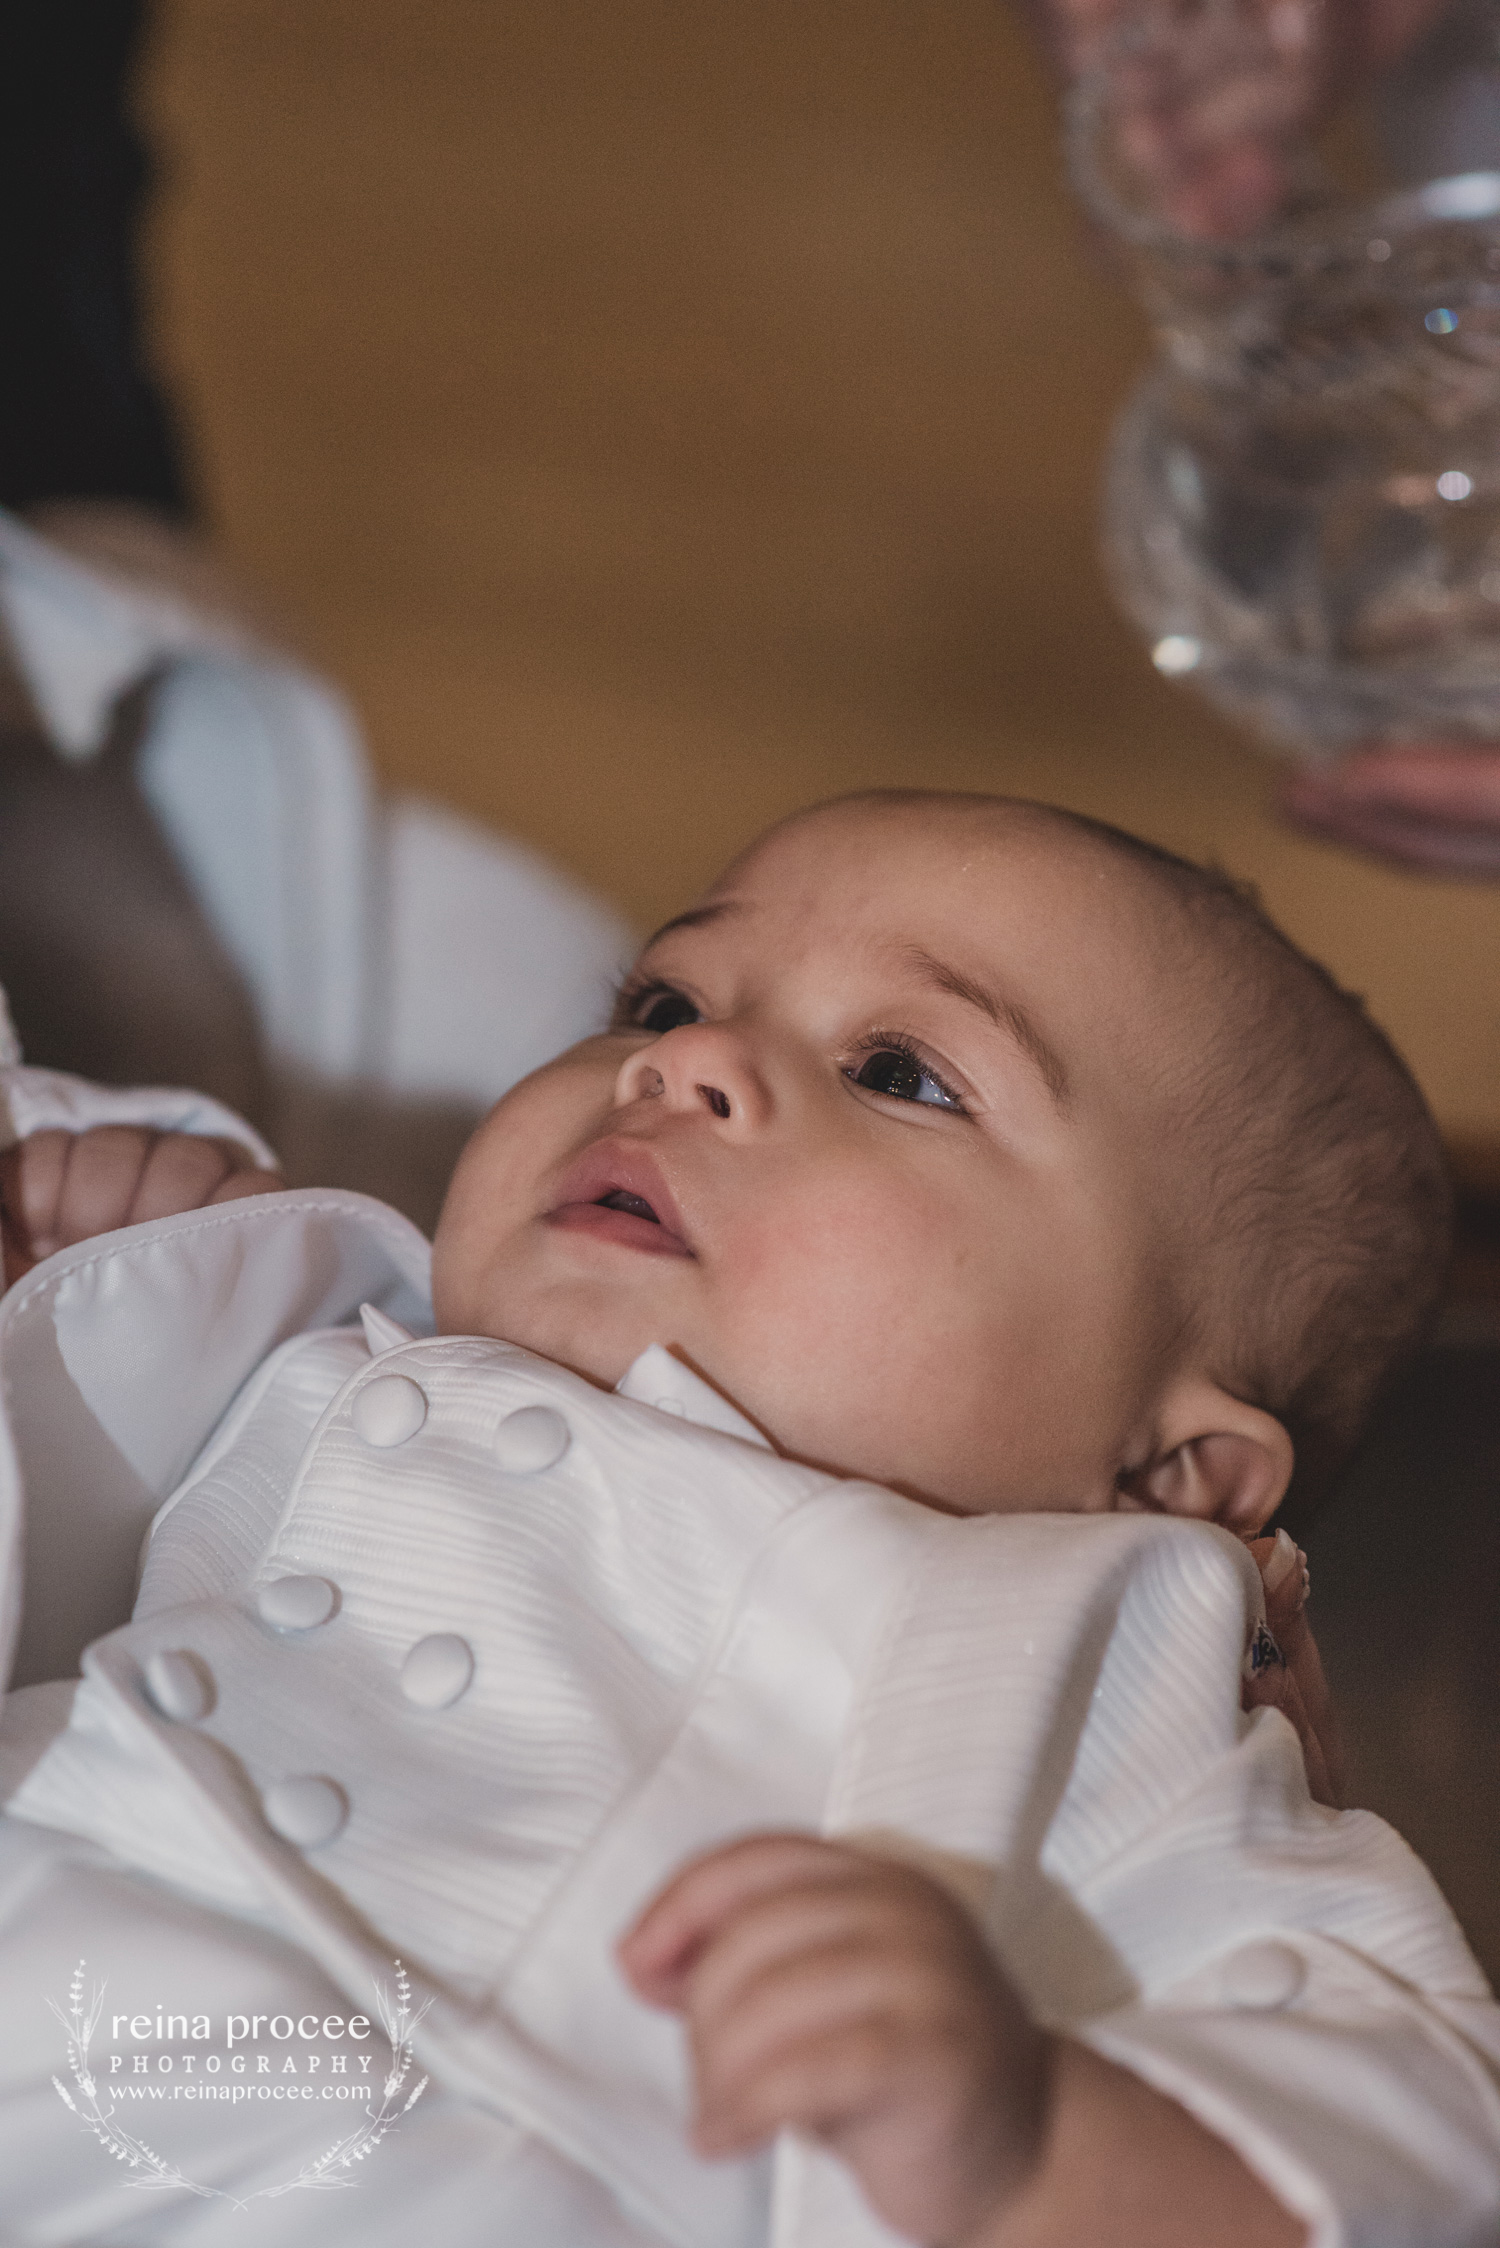 043-baptism-photographer-montreal-family-best-photos-portraits.jpg